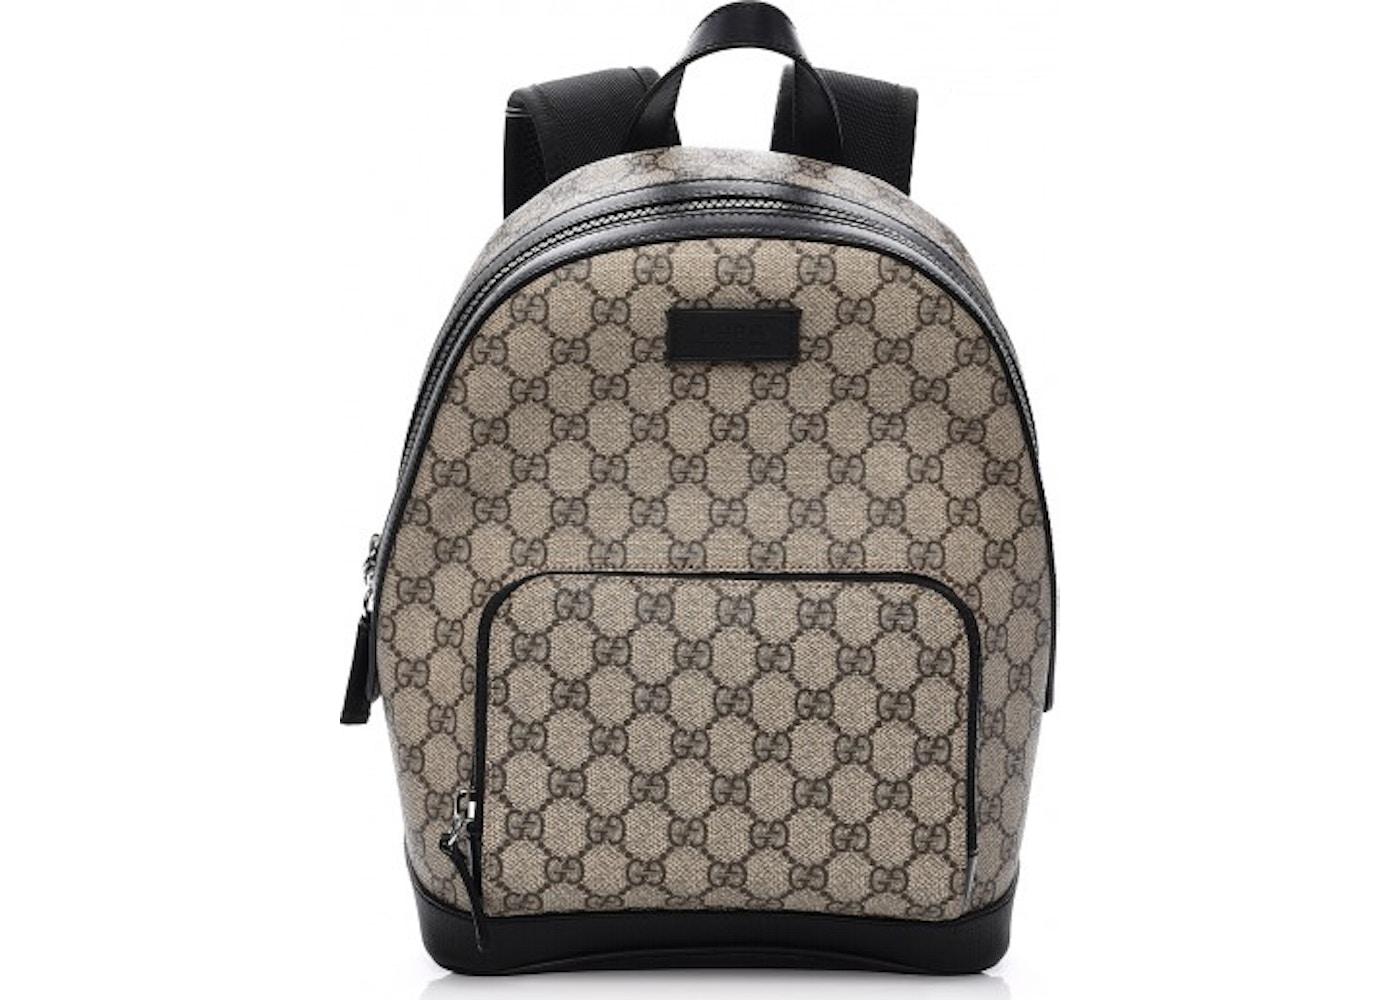 258d4e57eebc Buy   Sell Gucci Handbags - Price Premium